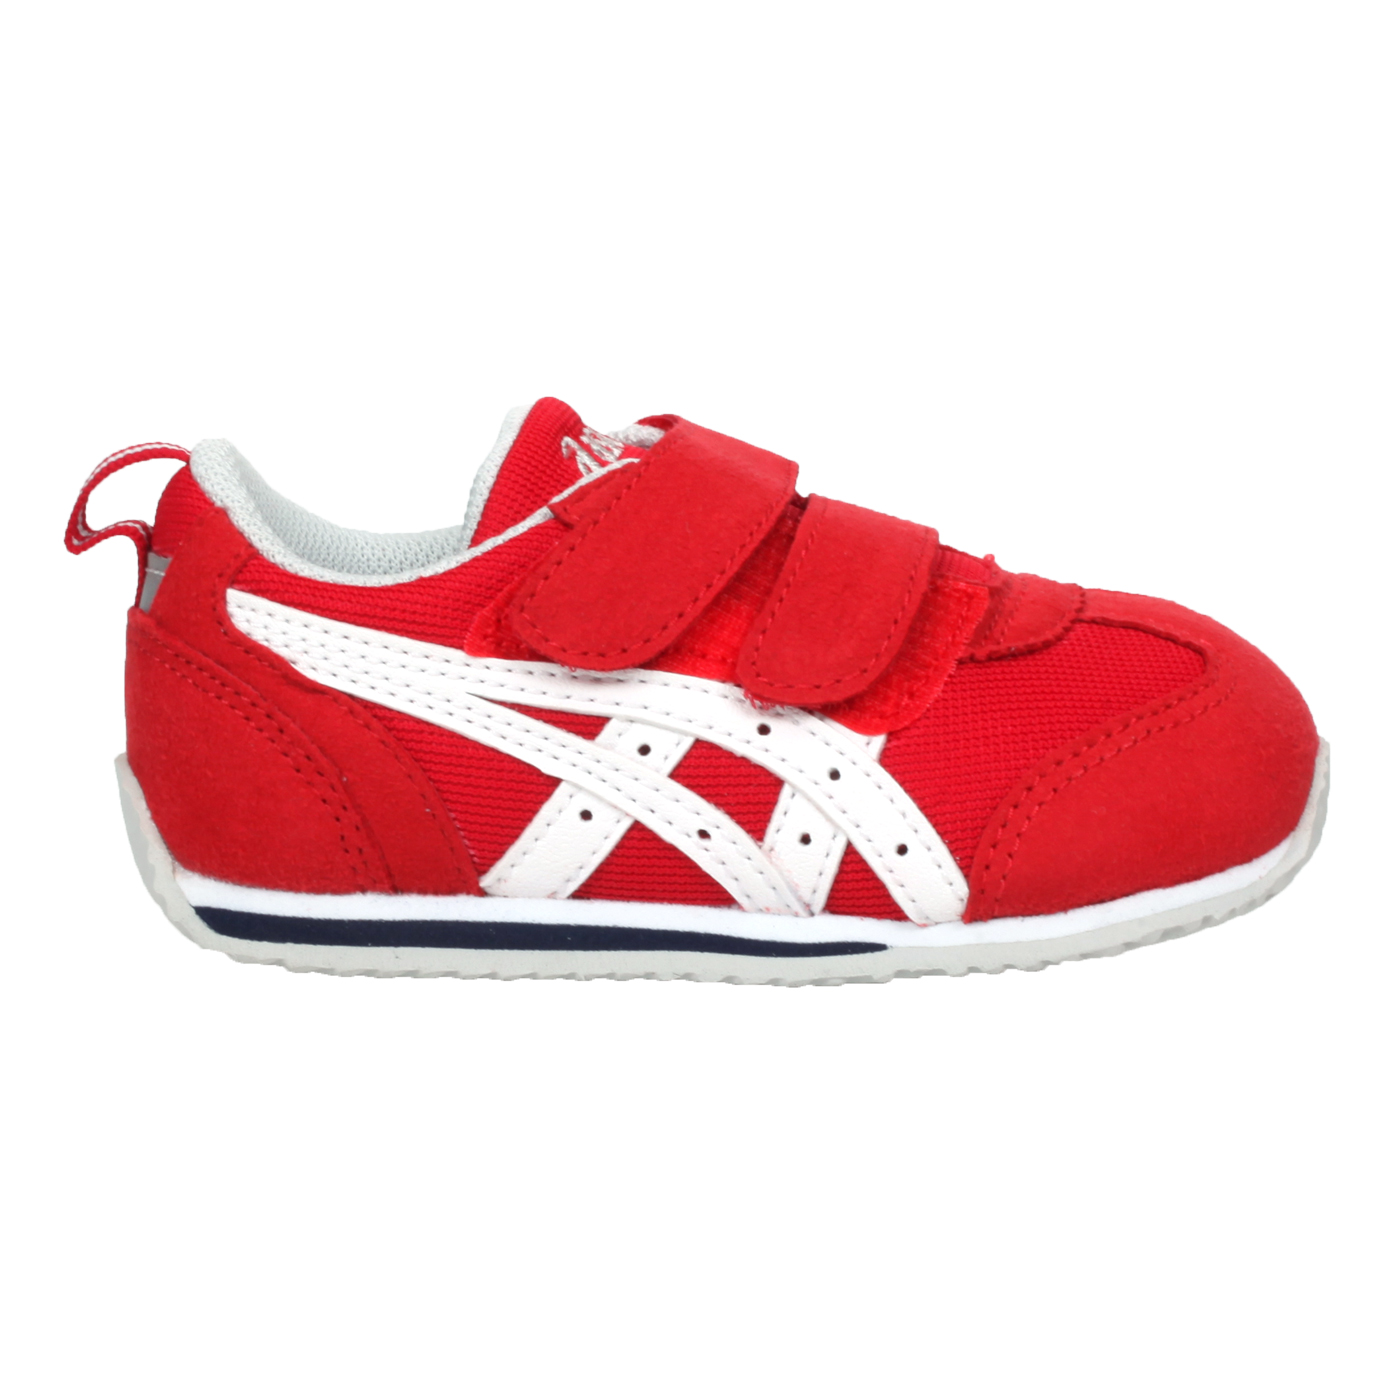 ASICS 小童運動鞋  @IDAHO BABY JP@TUB164-600 - 紅白